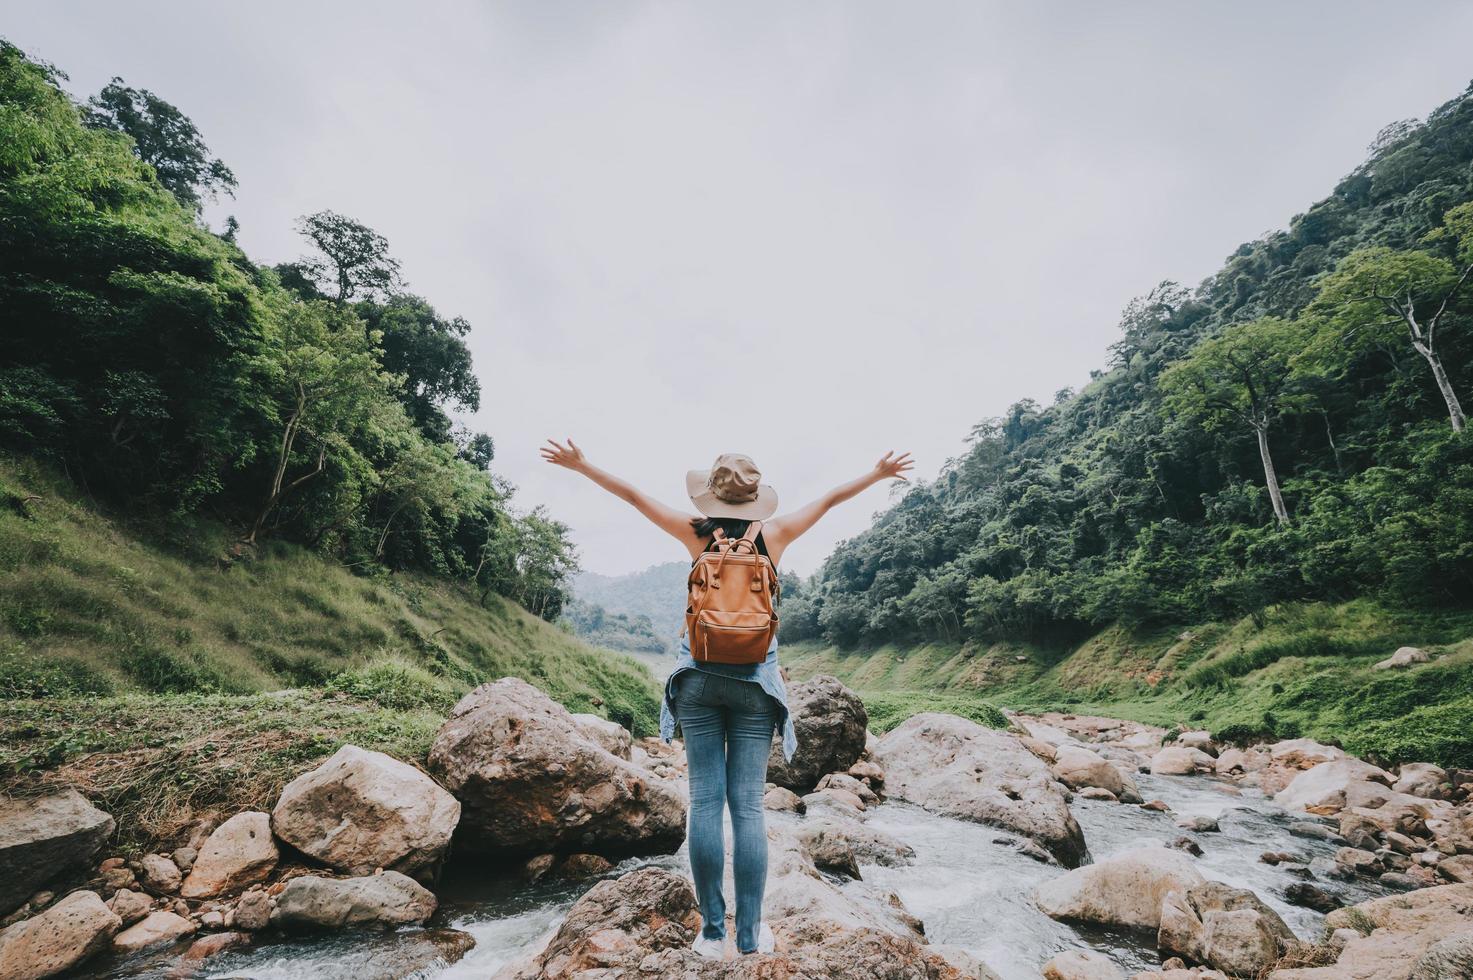 Woman enjoying nature photo